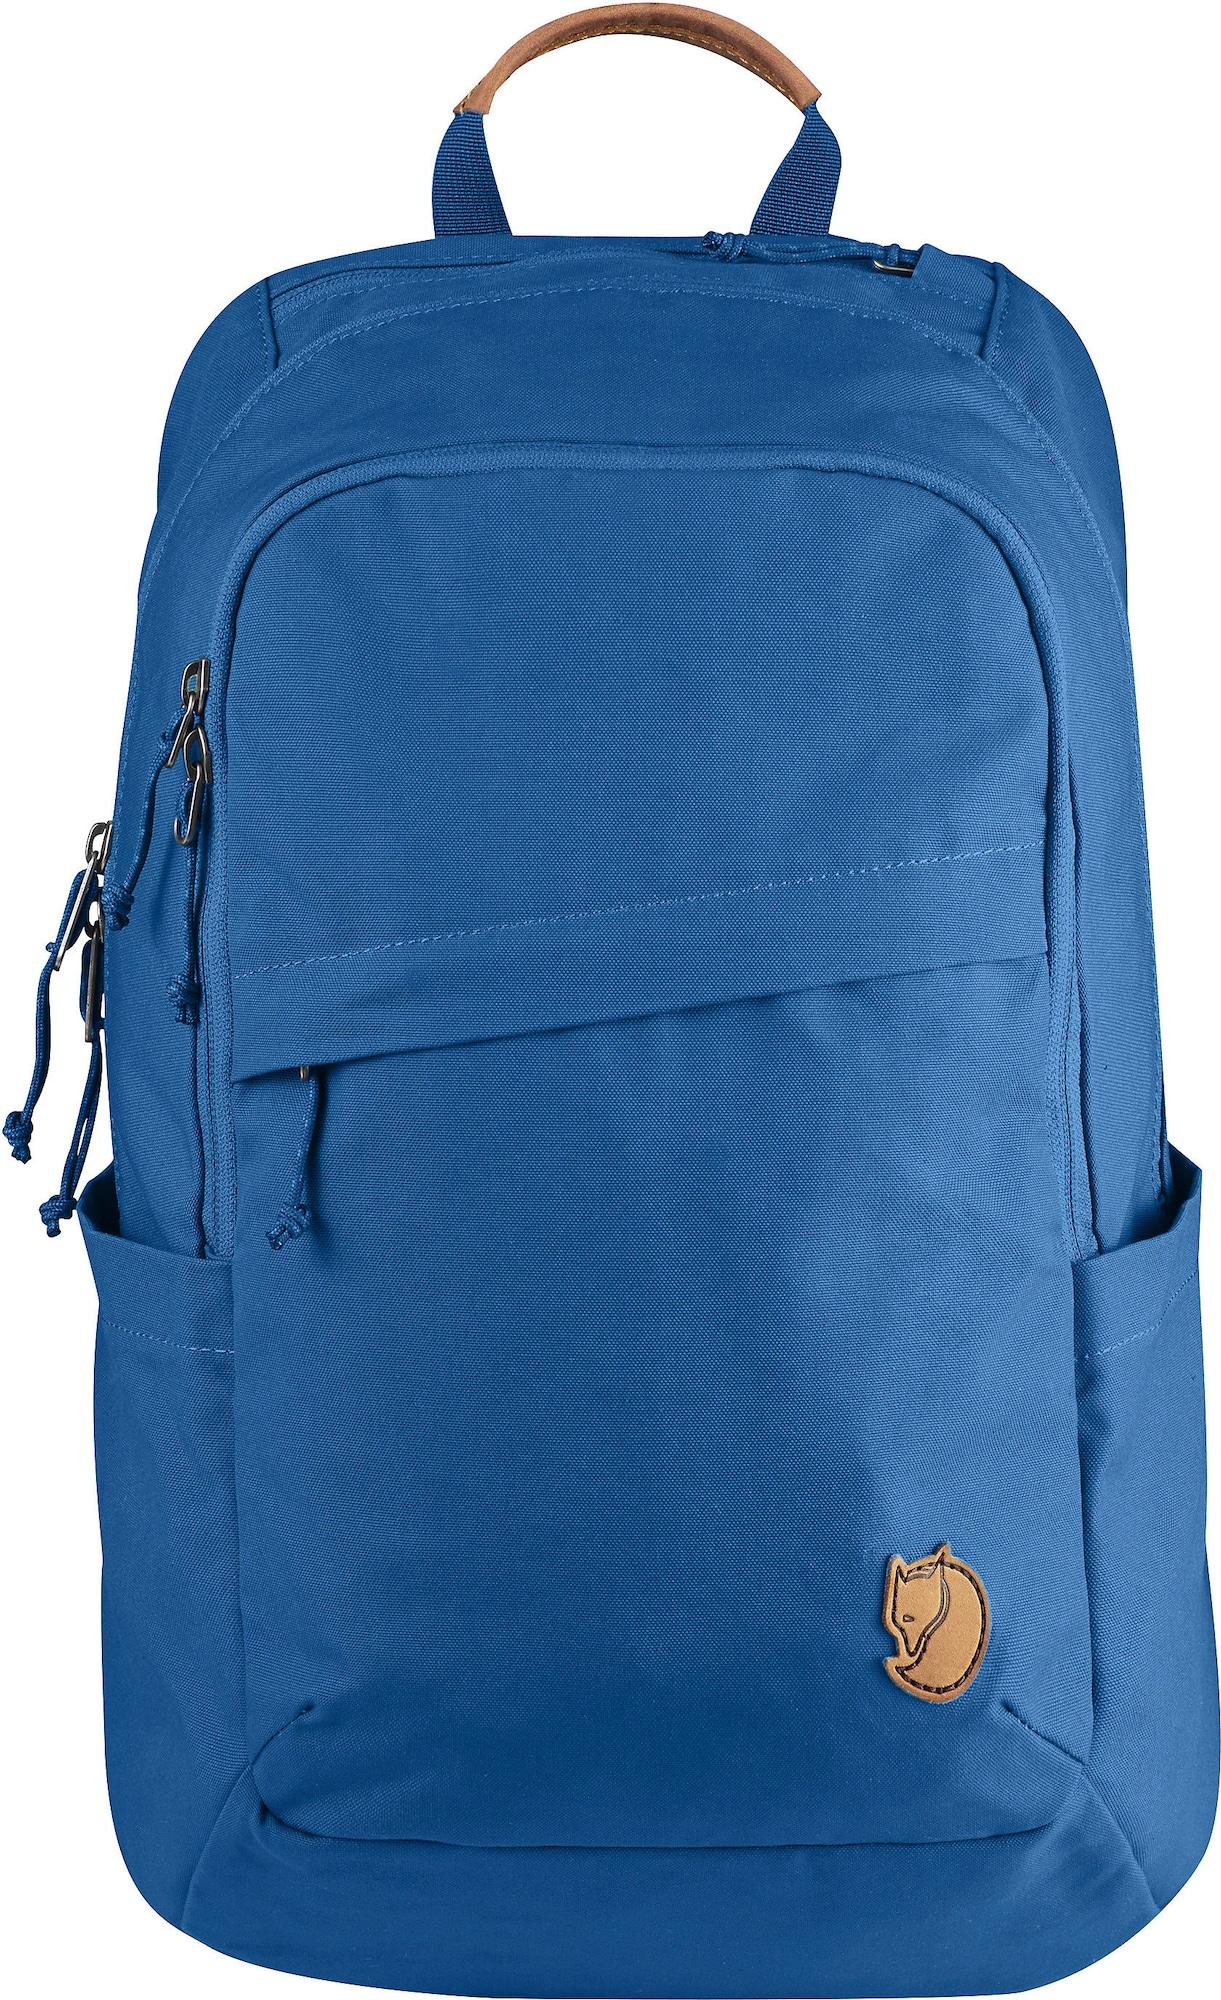 Daypack   Taschen > Rucksäcke > Tagesrucksäcke   Fjällräven